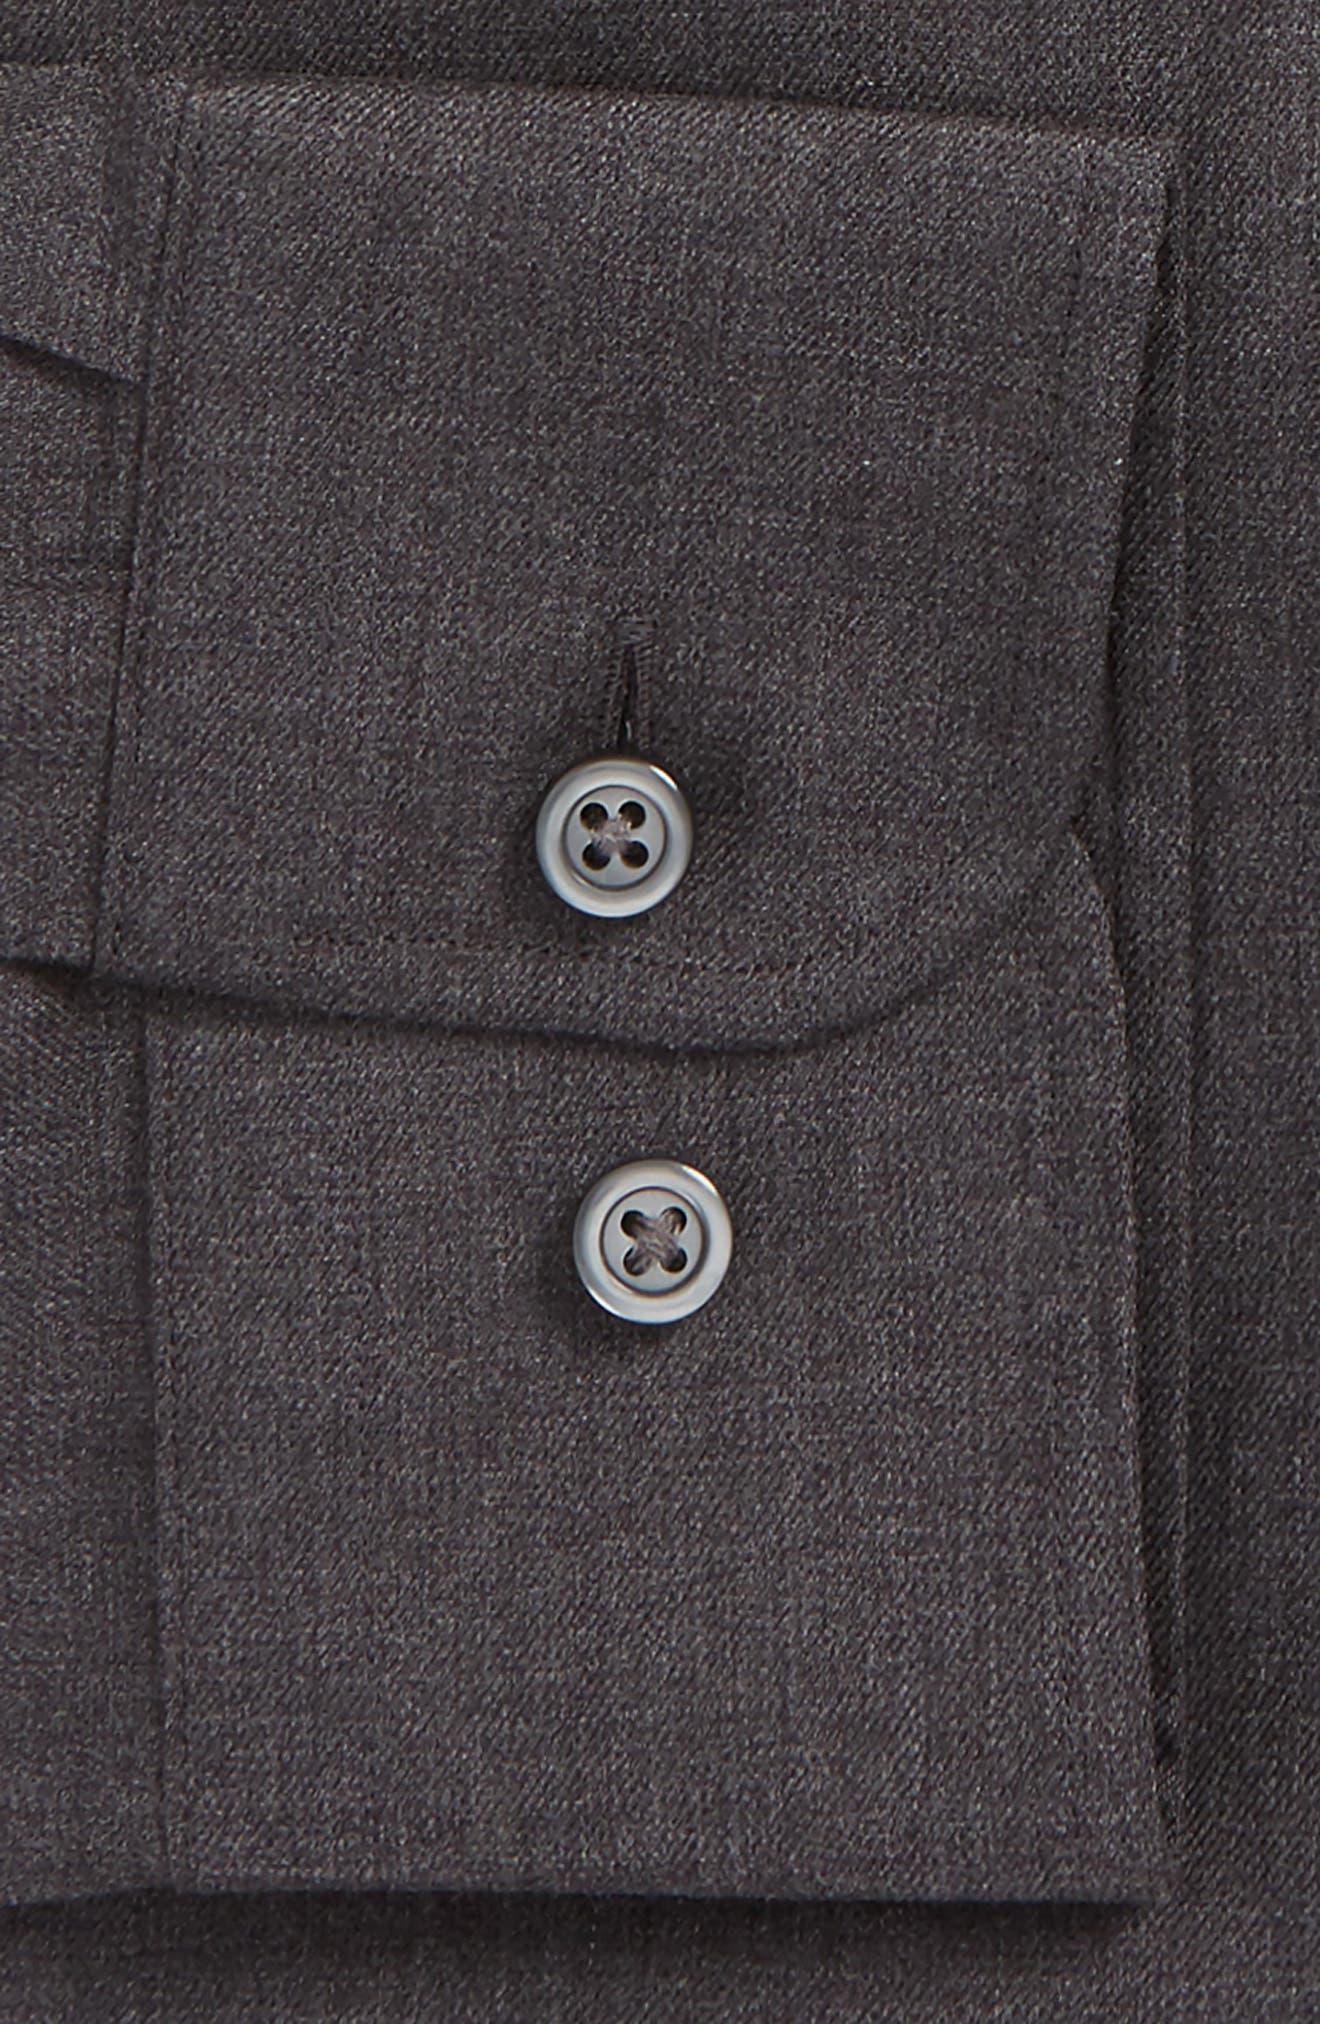 Trim Fit Solid Dress Shirt,                             Alternate thumbnail 2, color,                             Grey Phantom